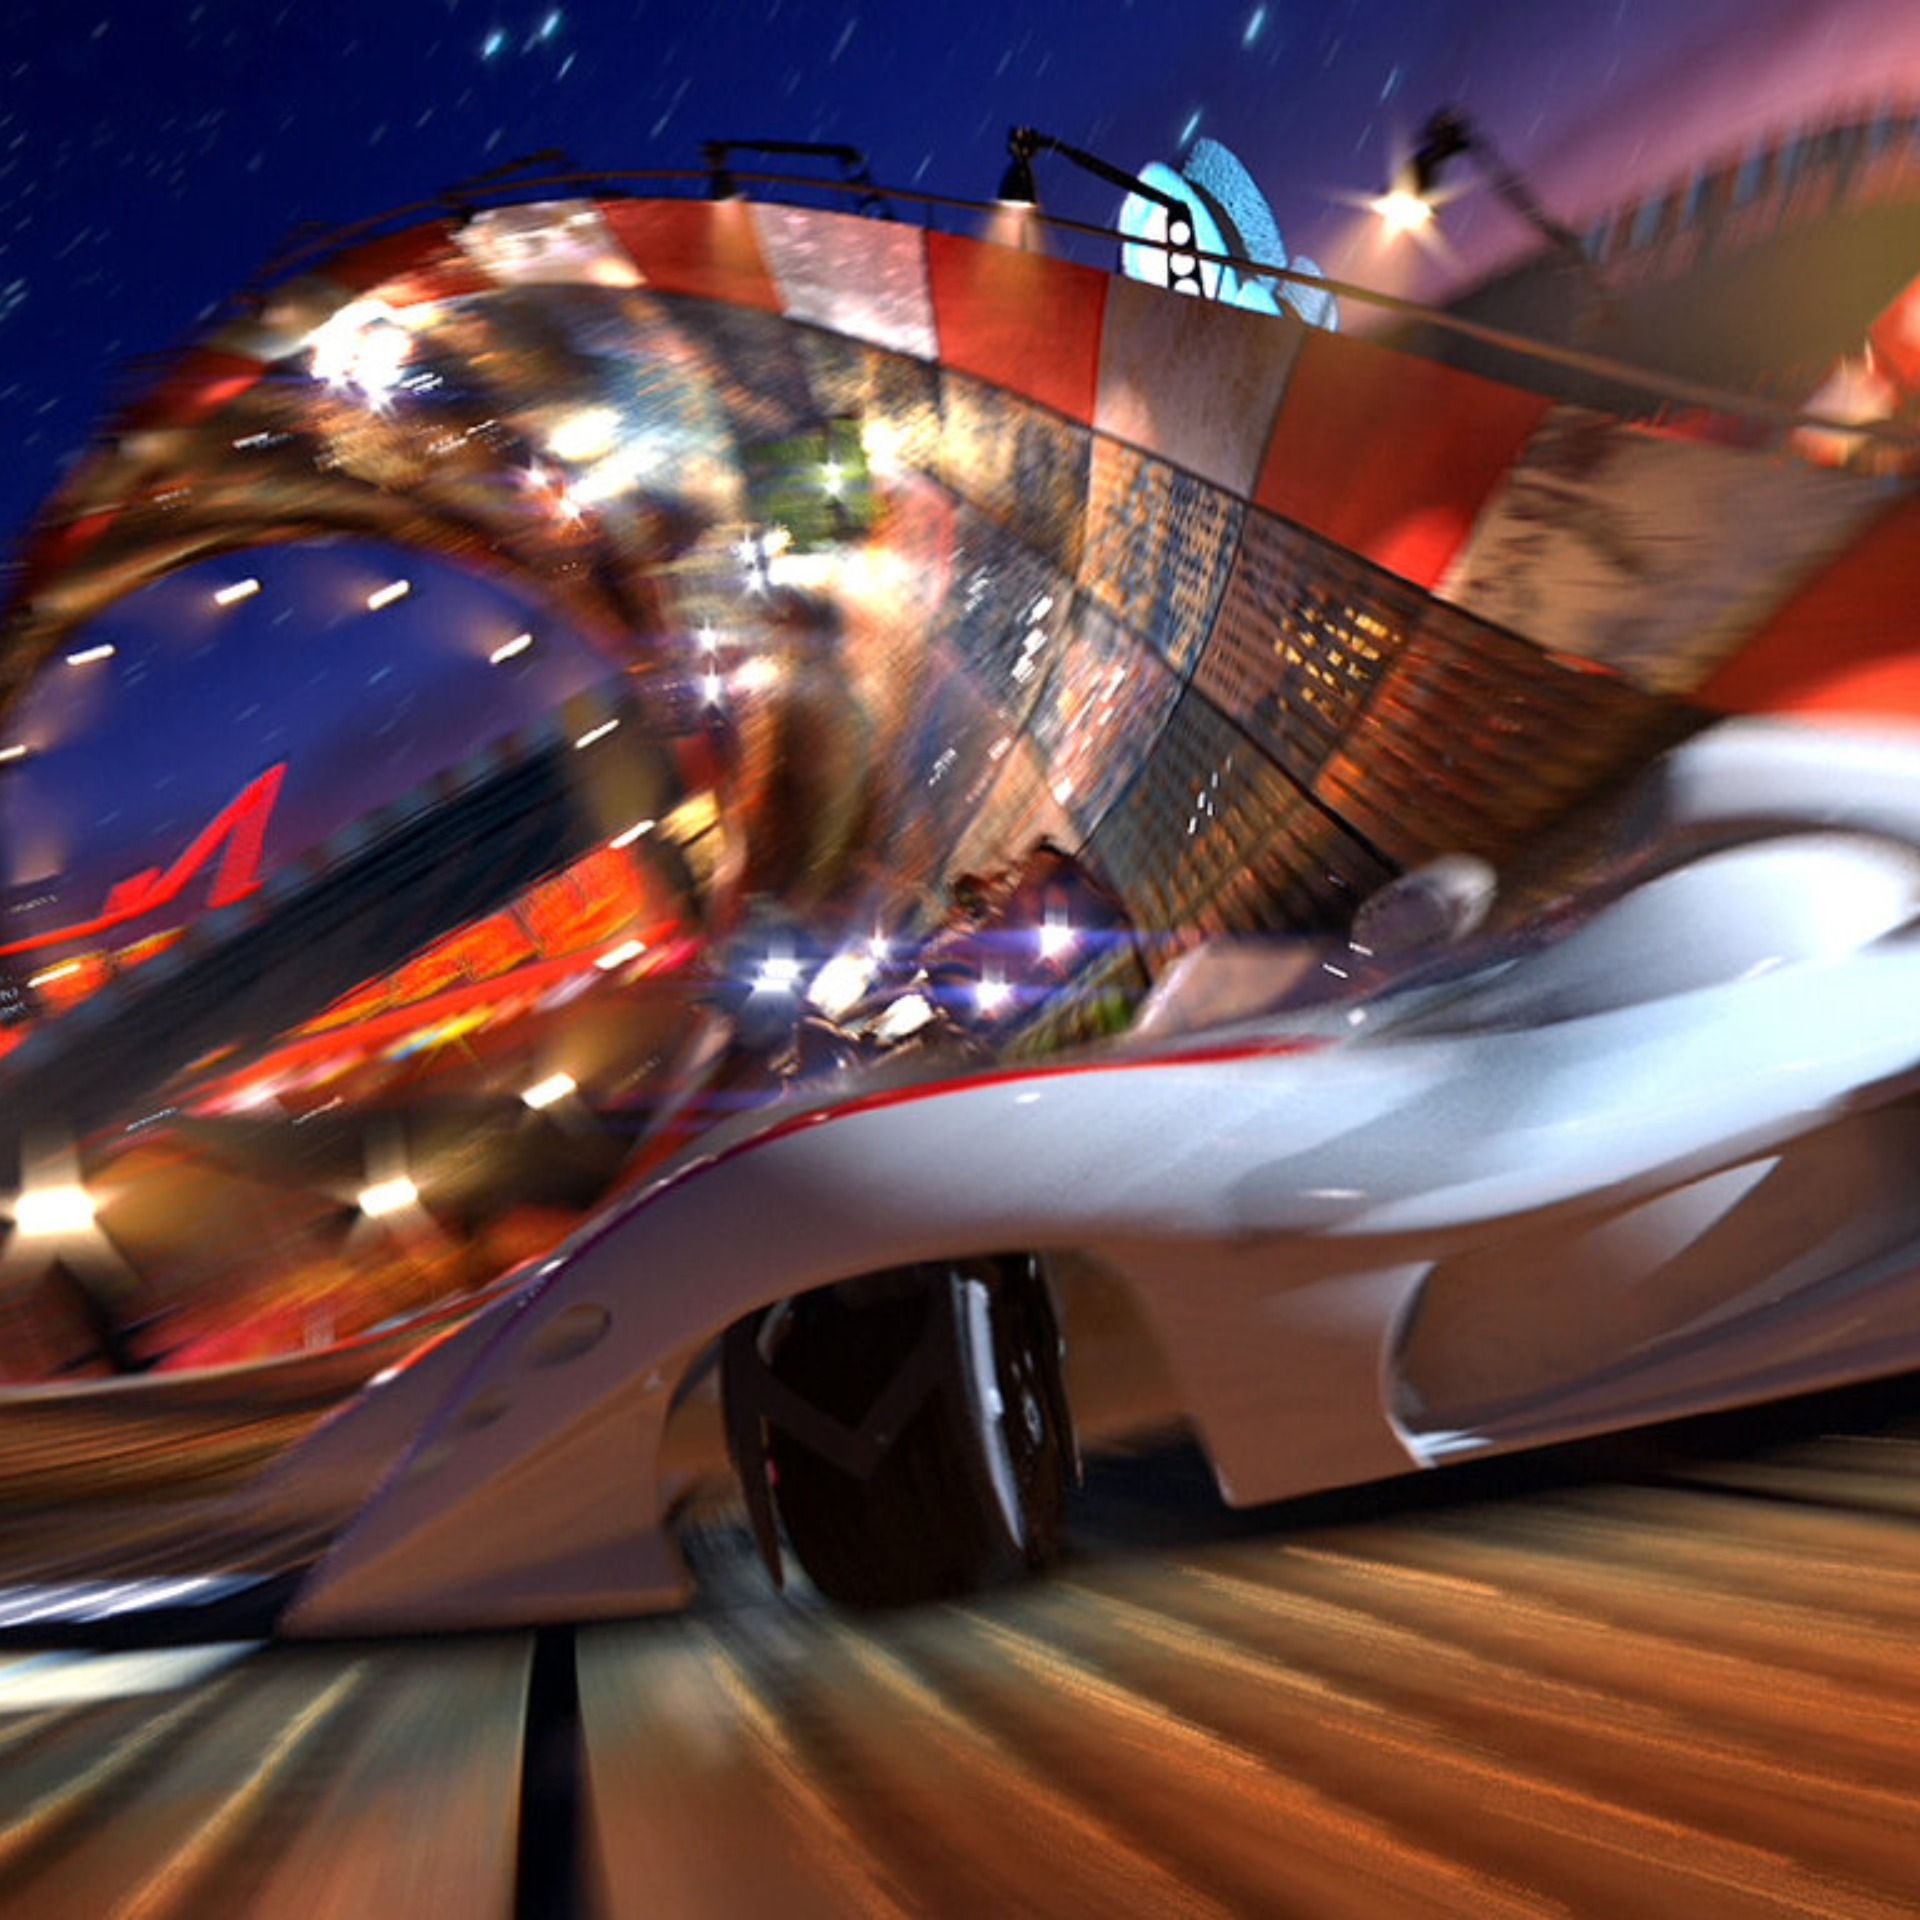 Speed Racer (Filmmaking Elements)